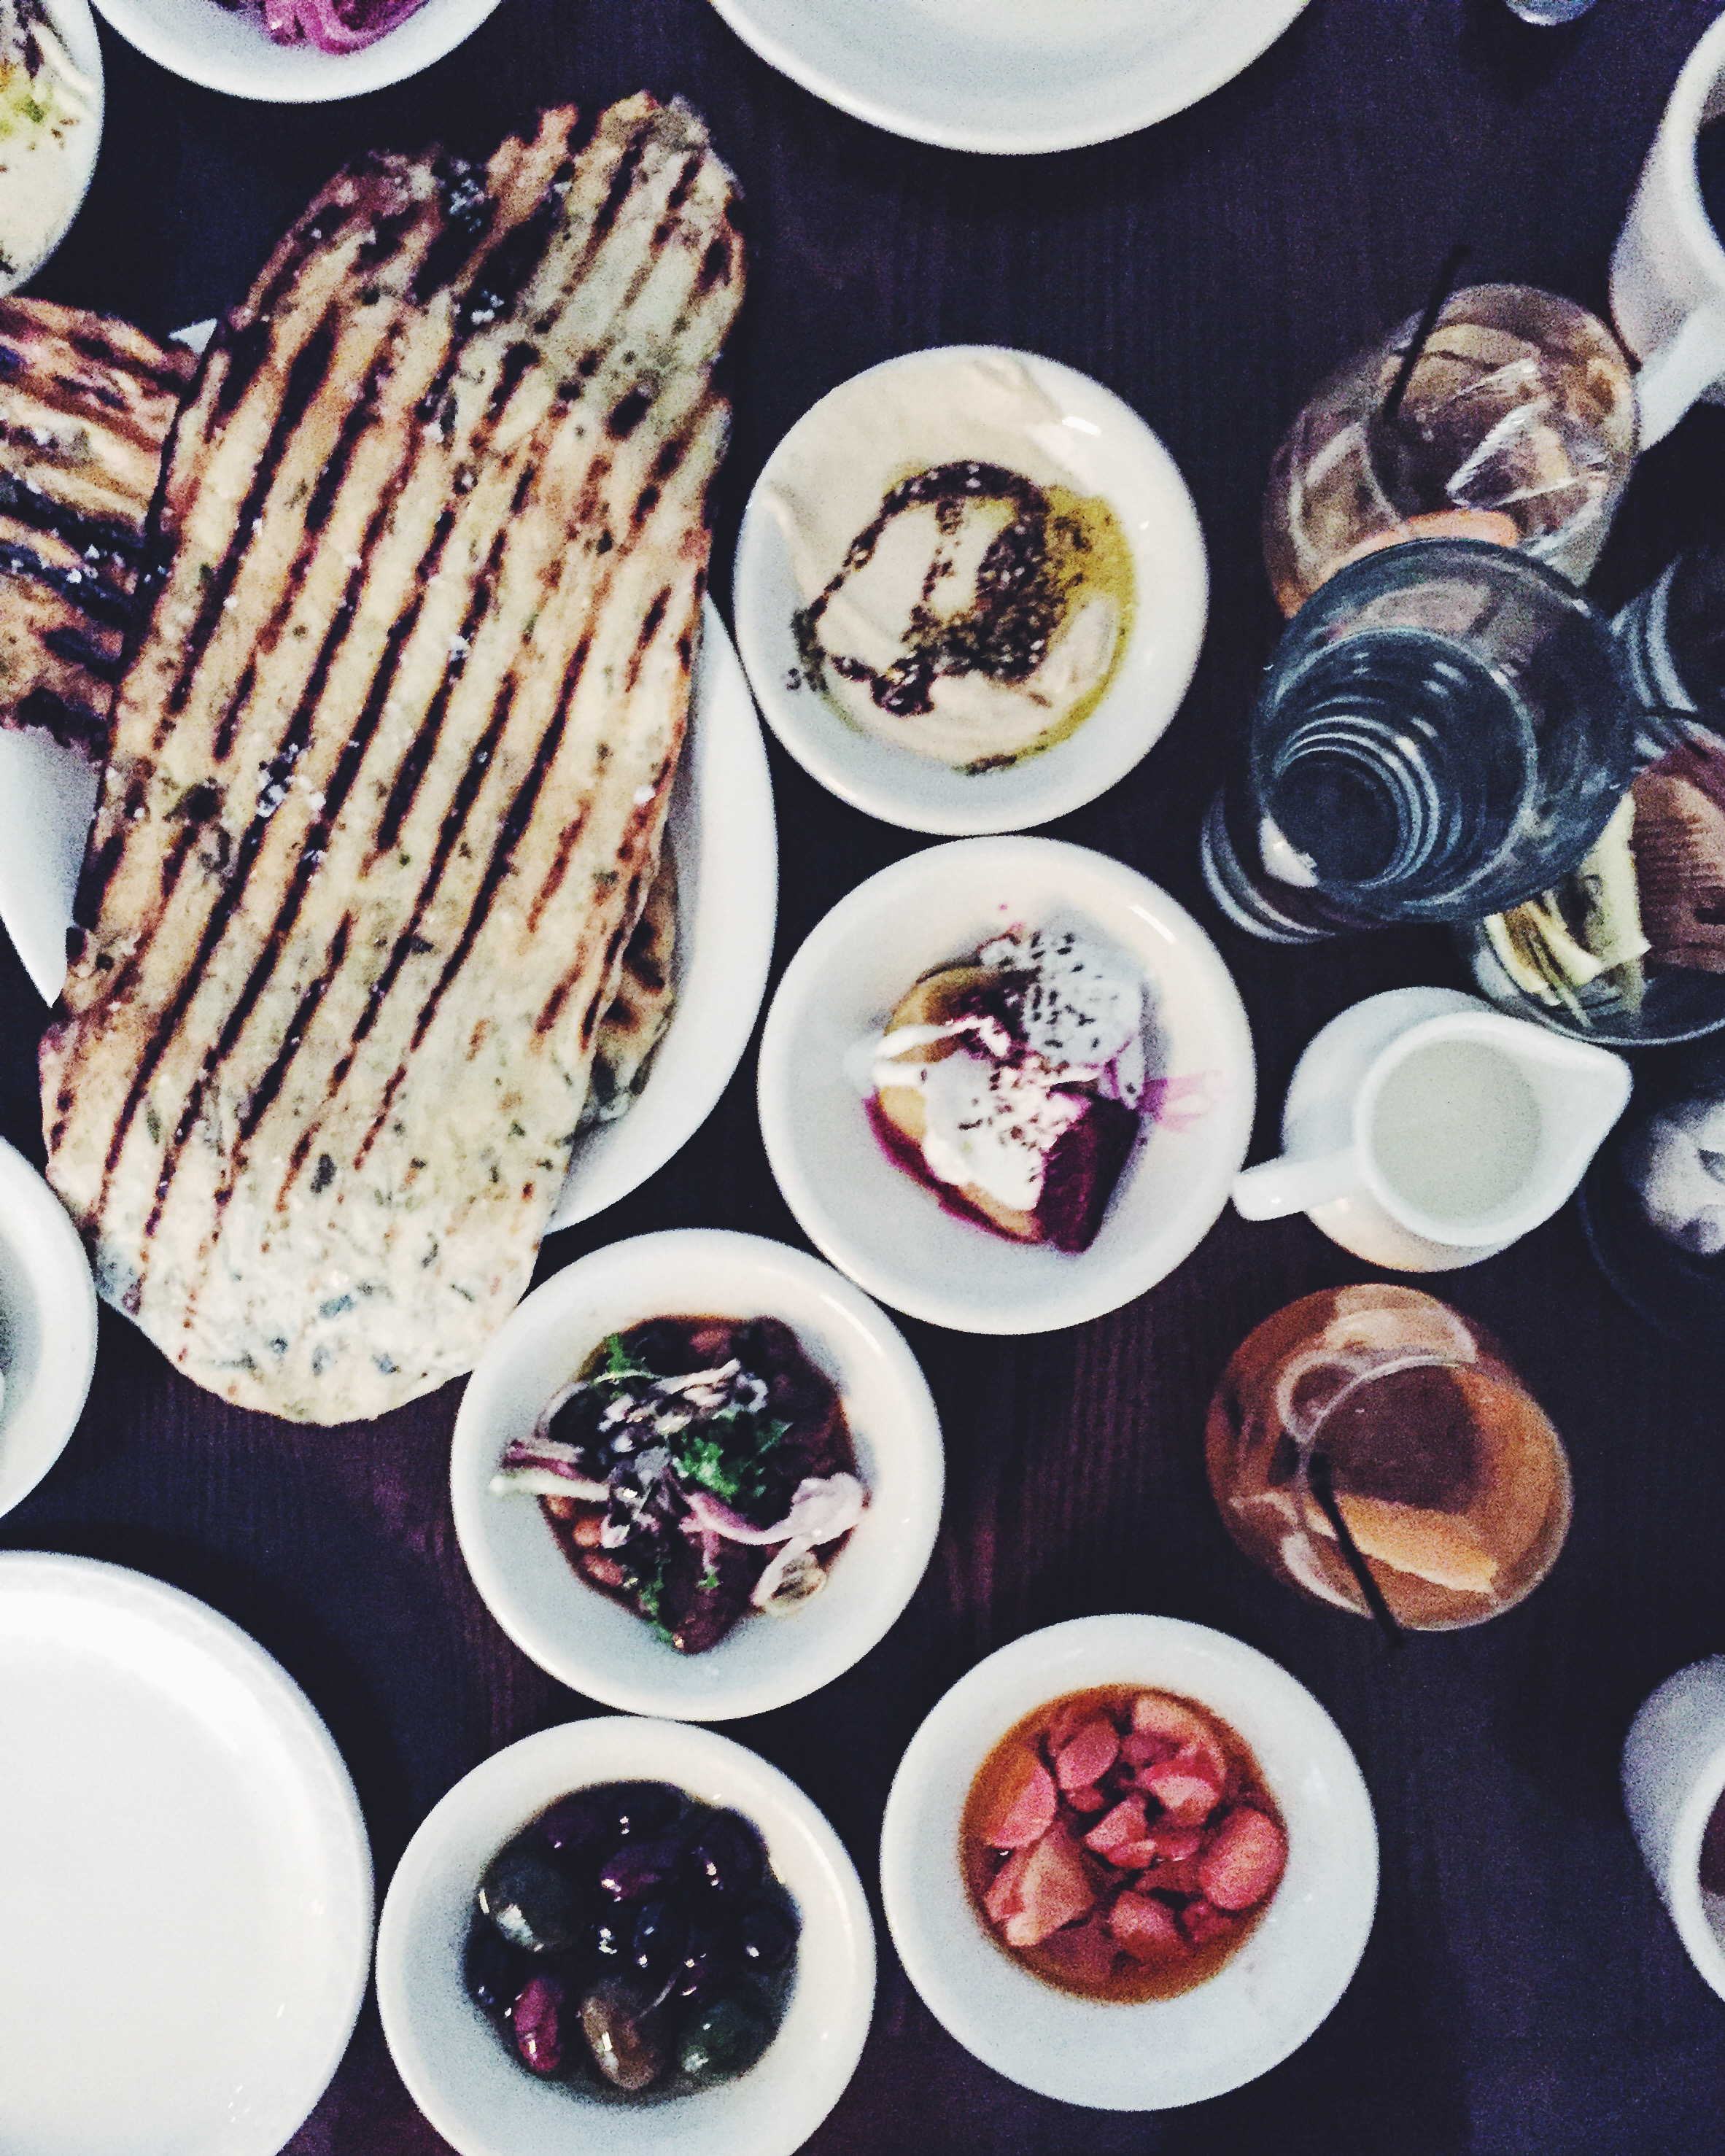 The Mezze Feast